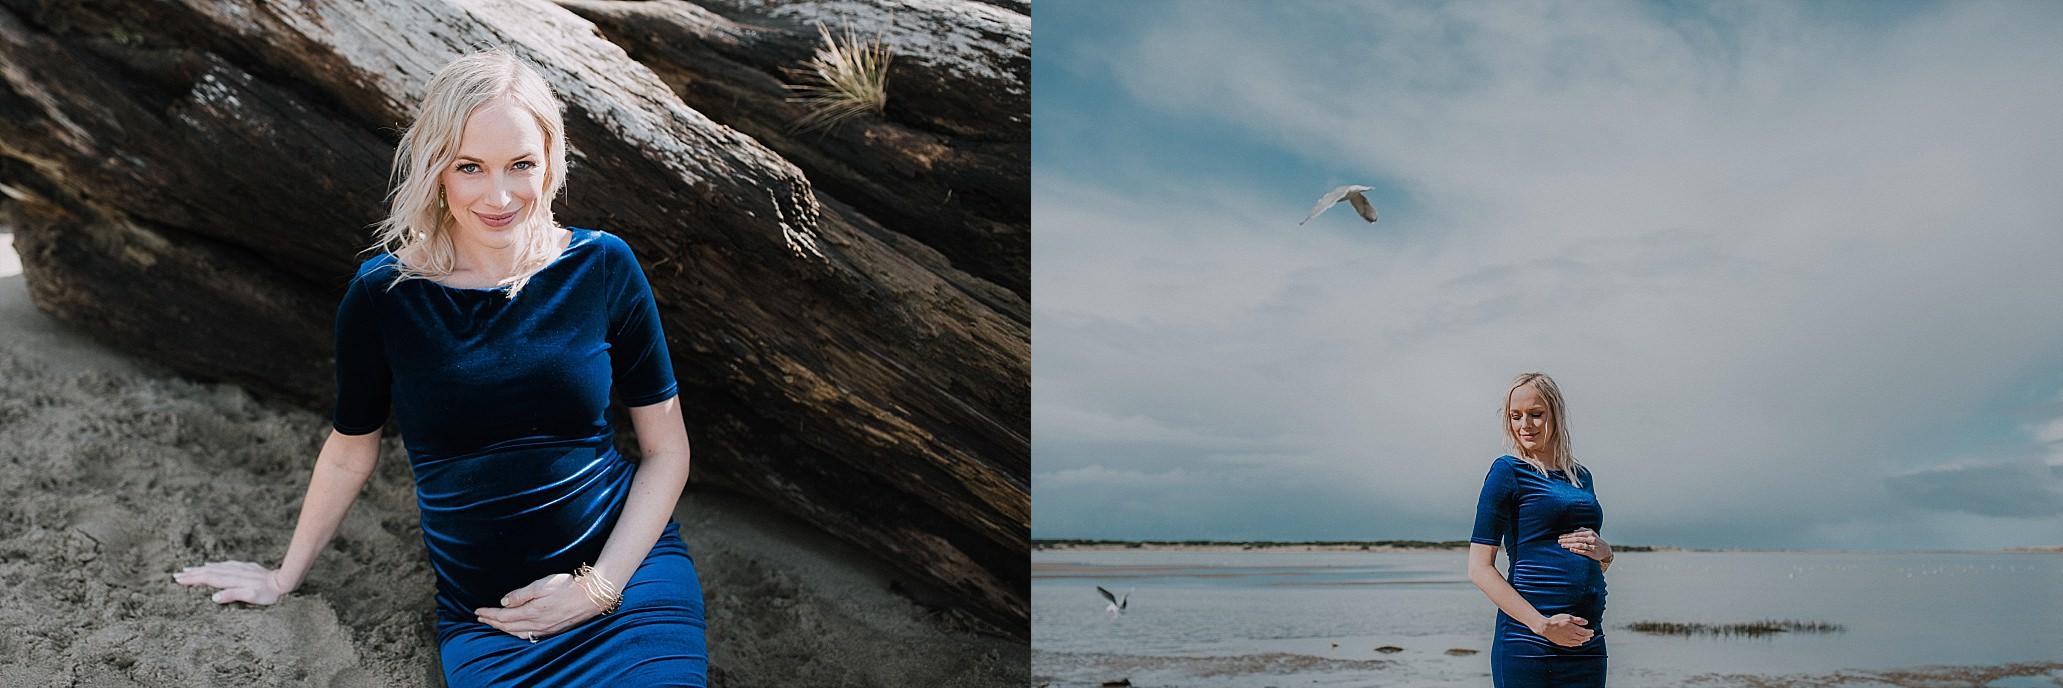 Oregon Coast Portrait Photographer (17).jpg